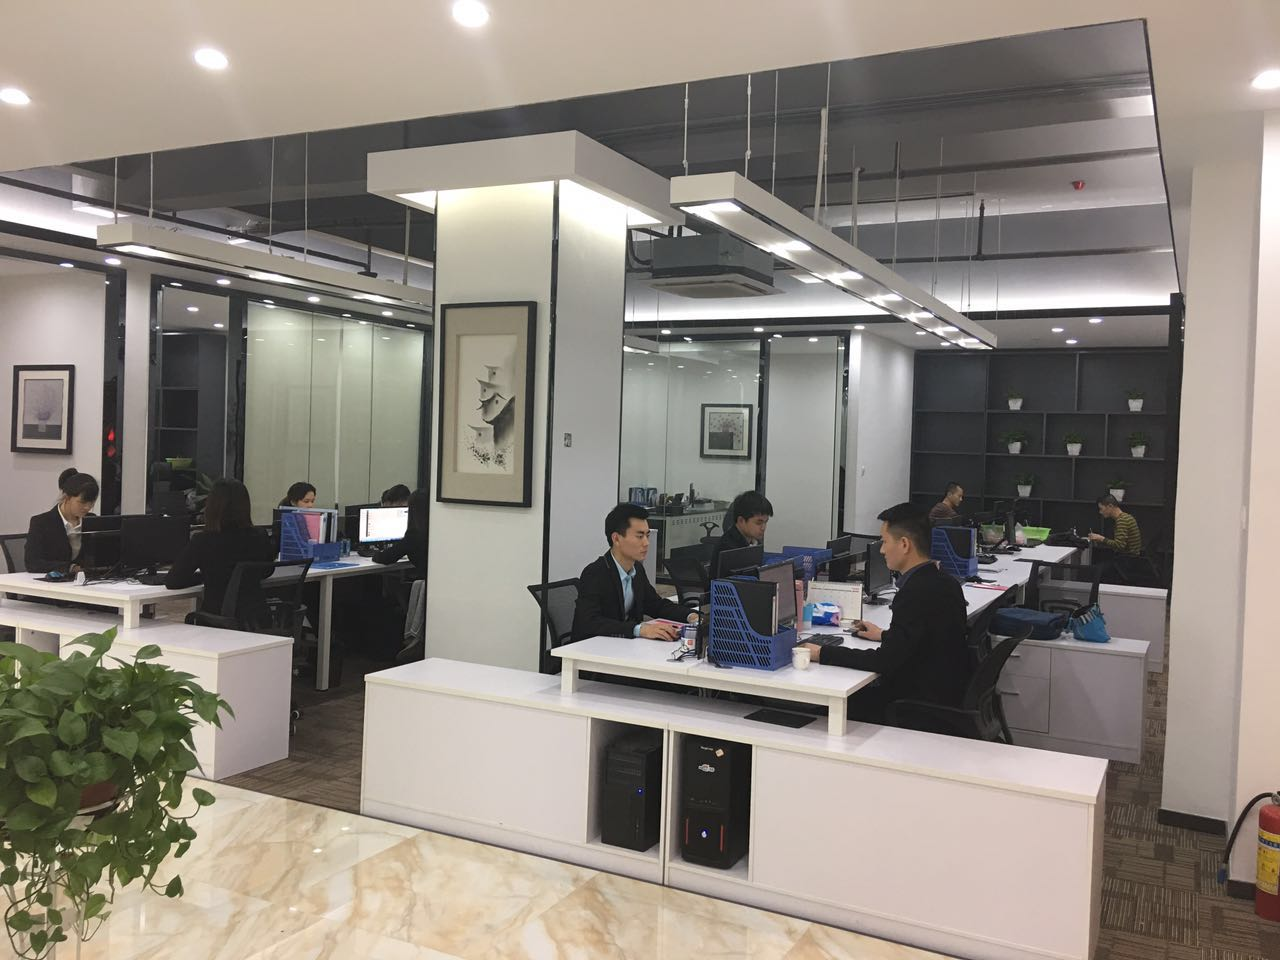 hbwant.com - Shijiazhuang Chuzhan Trading Co., Ltd